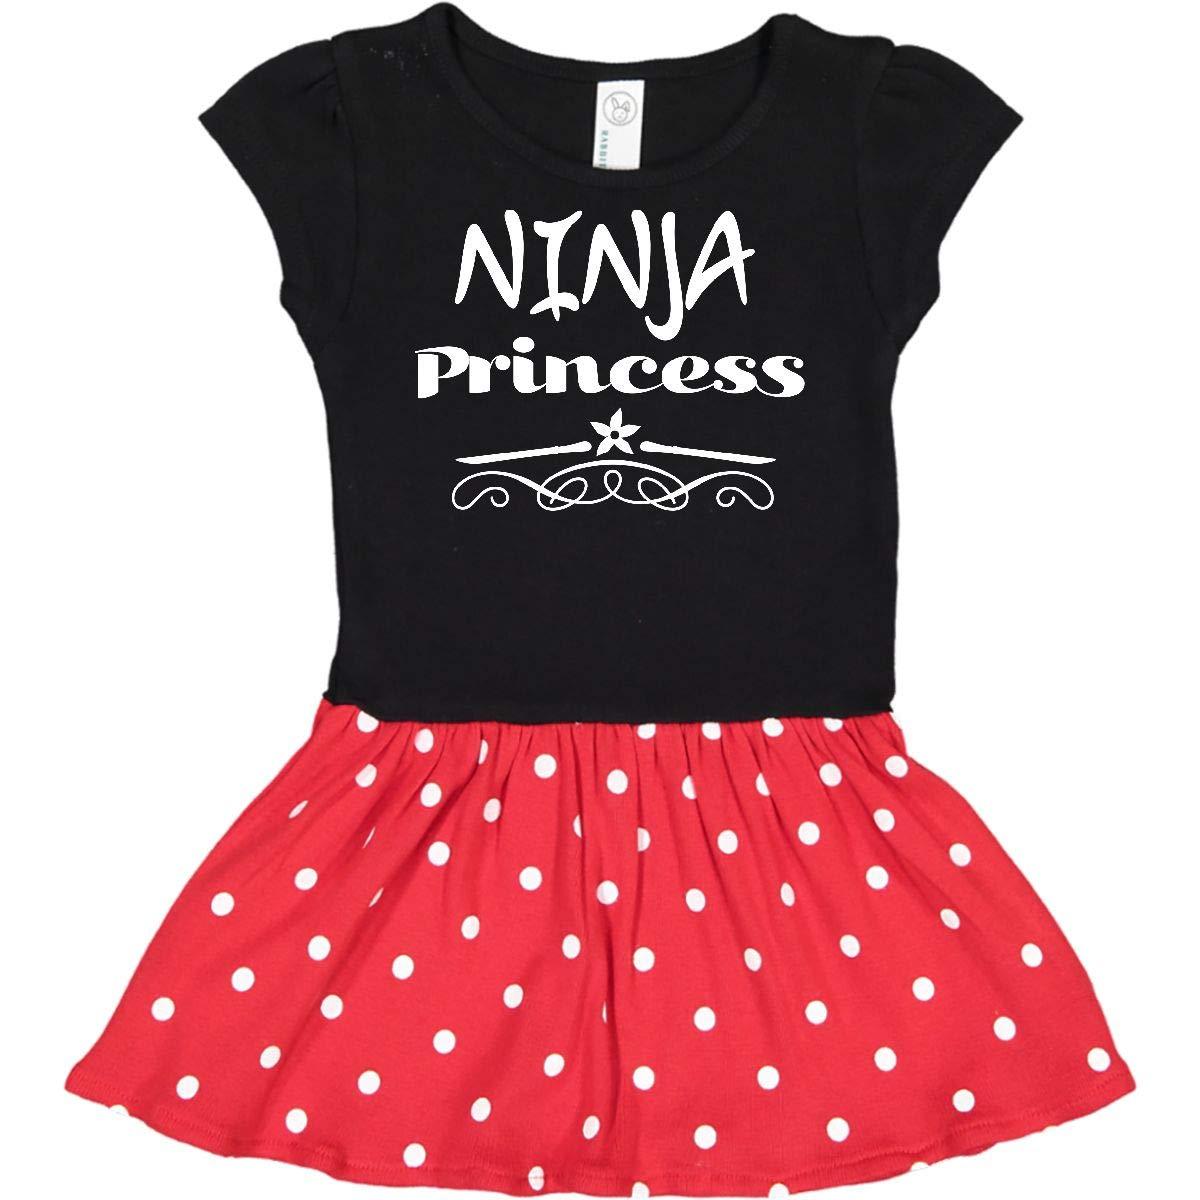 Amazon.com: inktastic - Ninja Princess Infant Dress 2ab37 ...